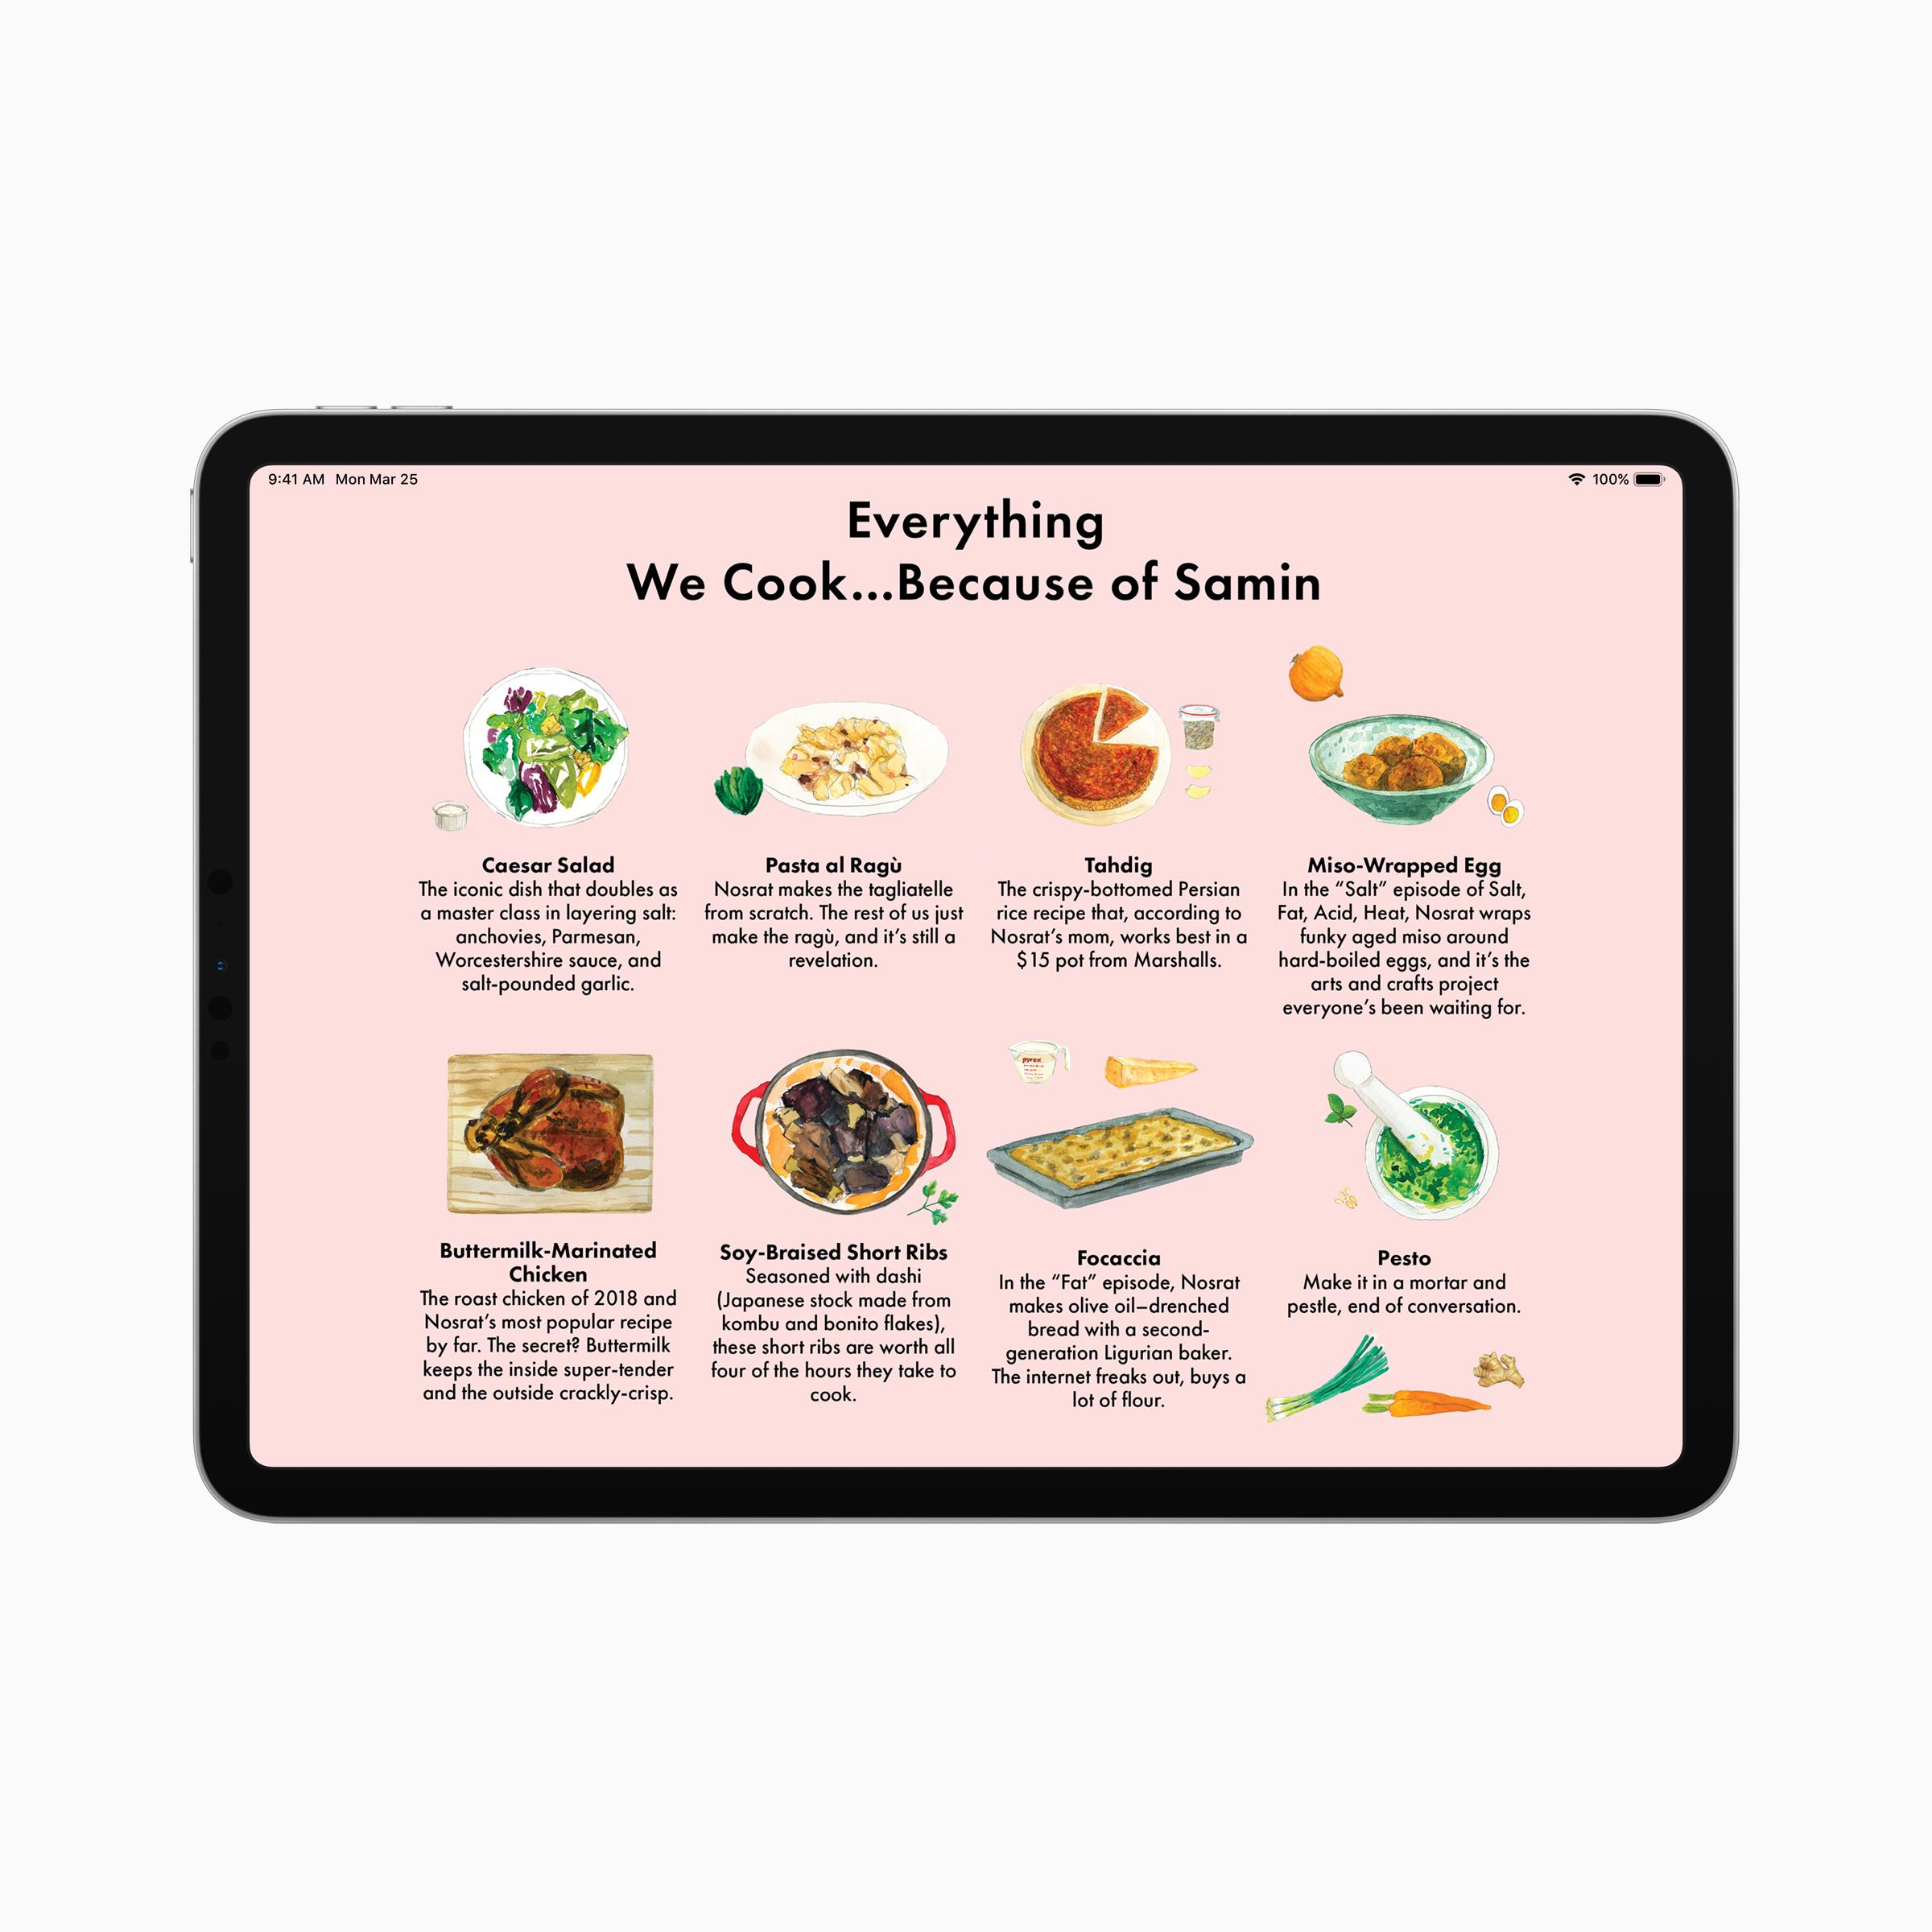 Apple news plus bon appetit ipad screen 03252019